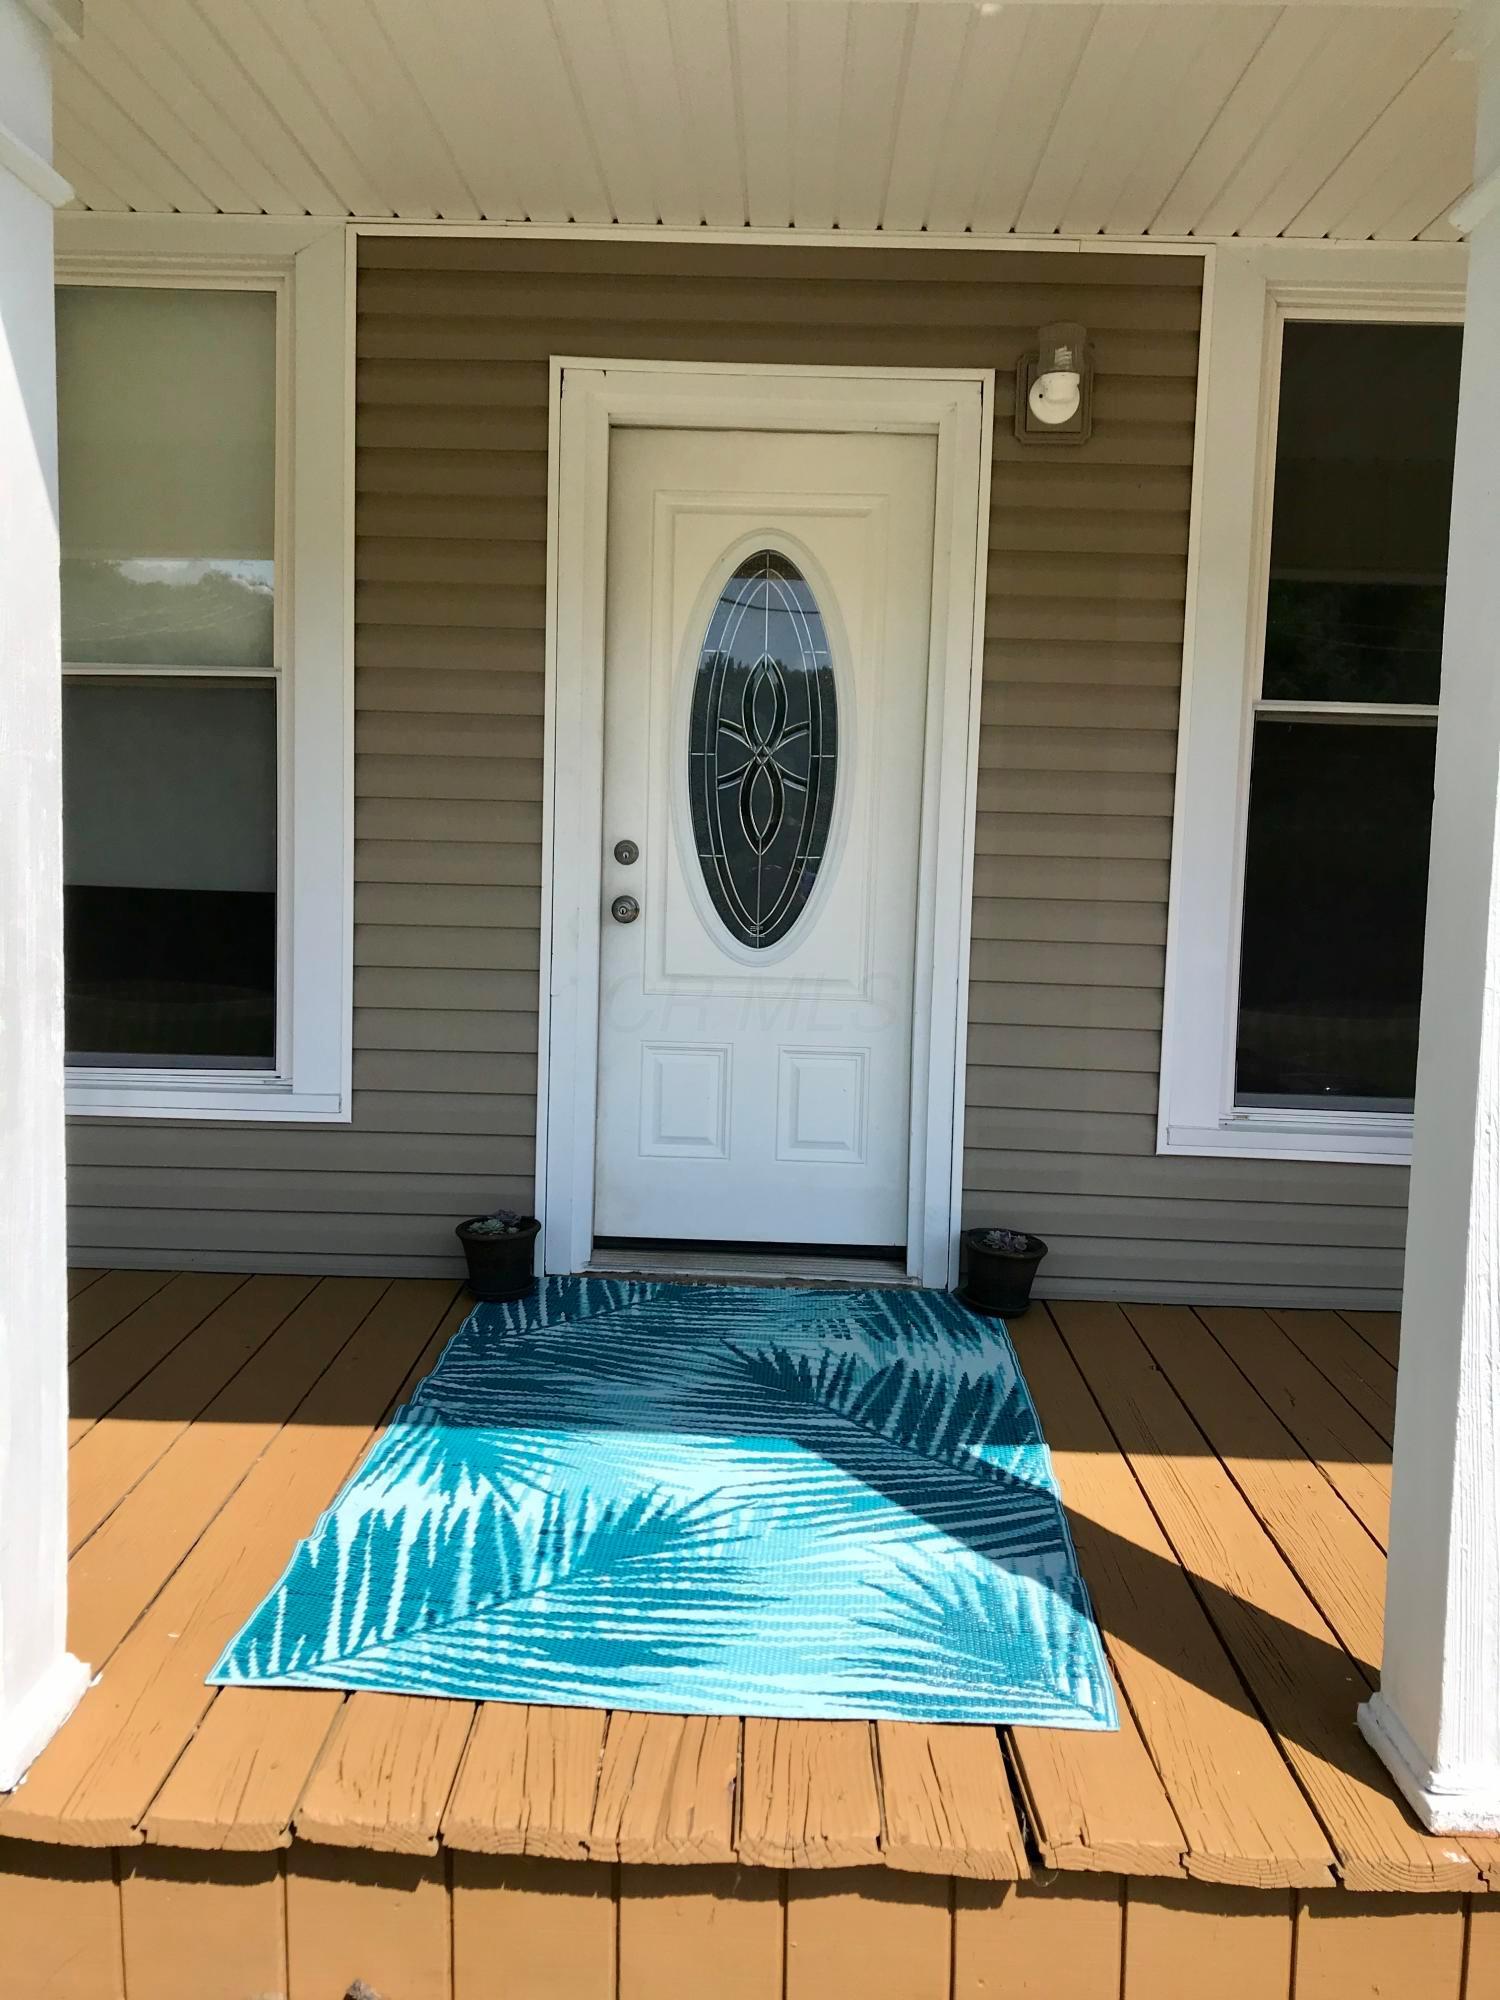 339 Main Street, Shawnee, Ohio 43782, 3 Bedrooms Bedrooms, ,2 BathroomsBathrooms,Residential,For Sale,Main,220025796